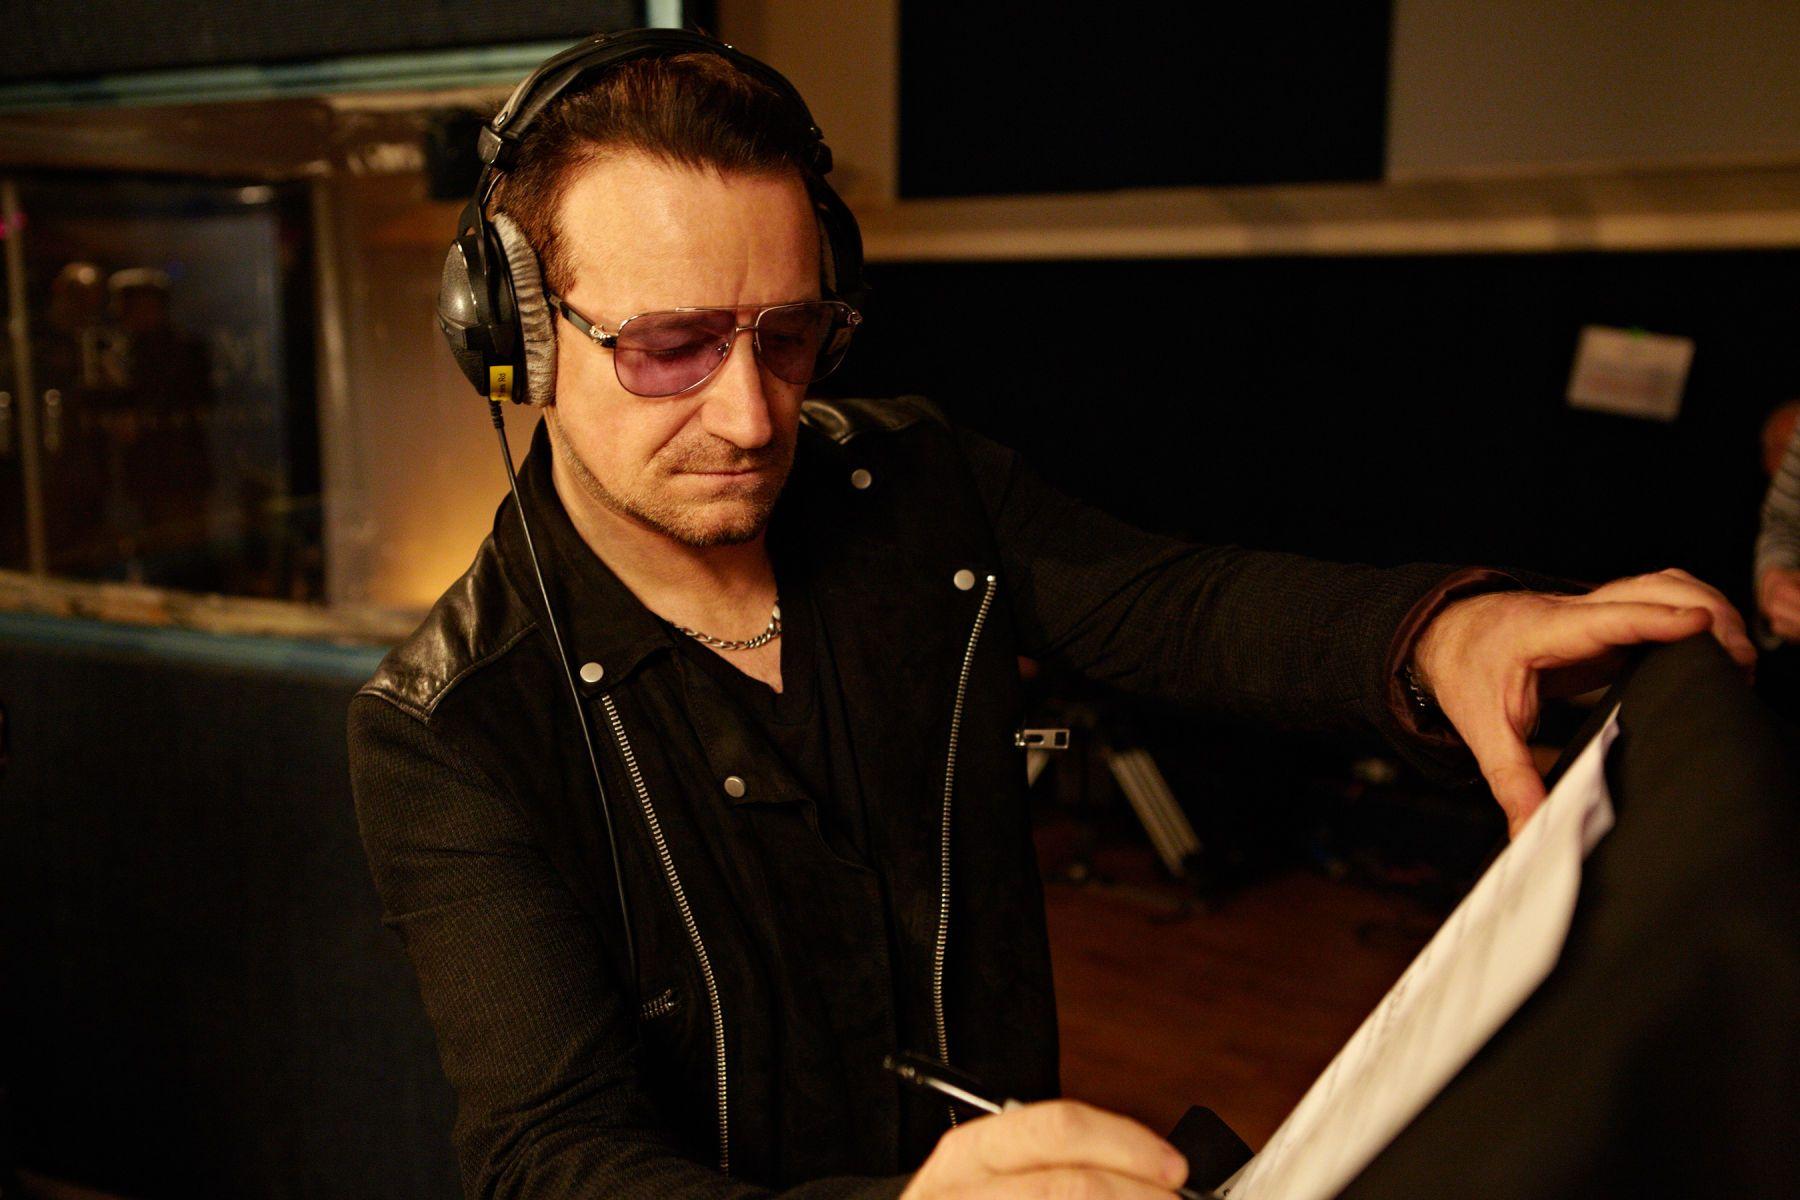 Bono Band Aid 30